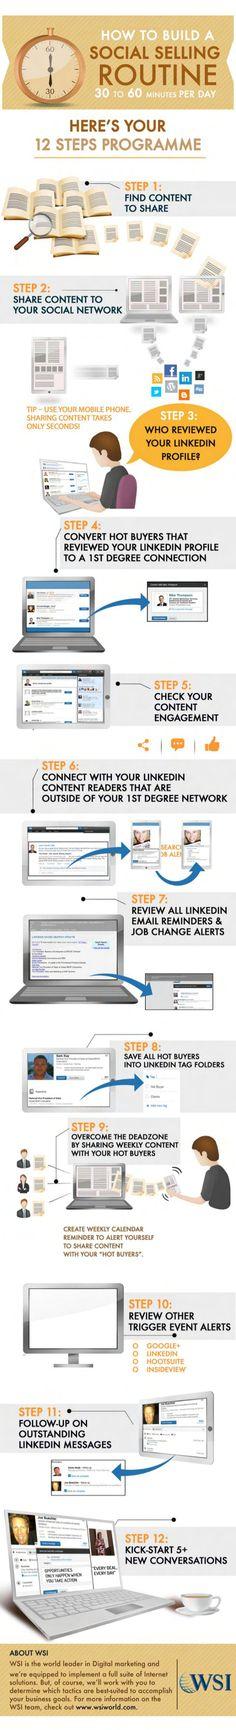 How to build a social selling routine #infografia #infographic #socialmedia